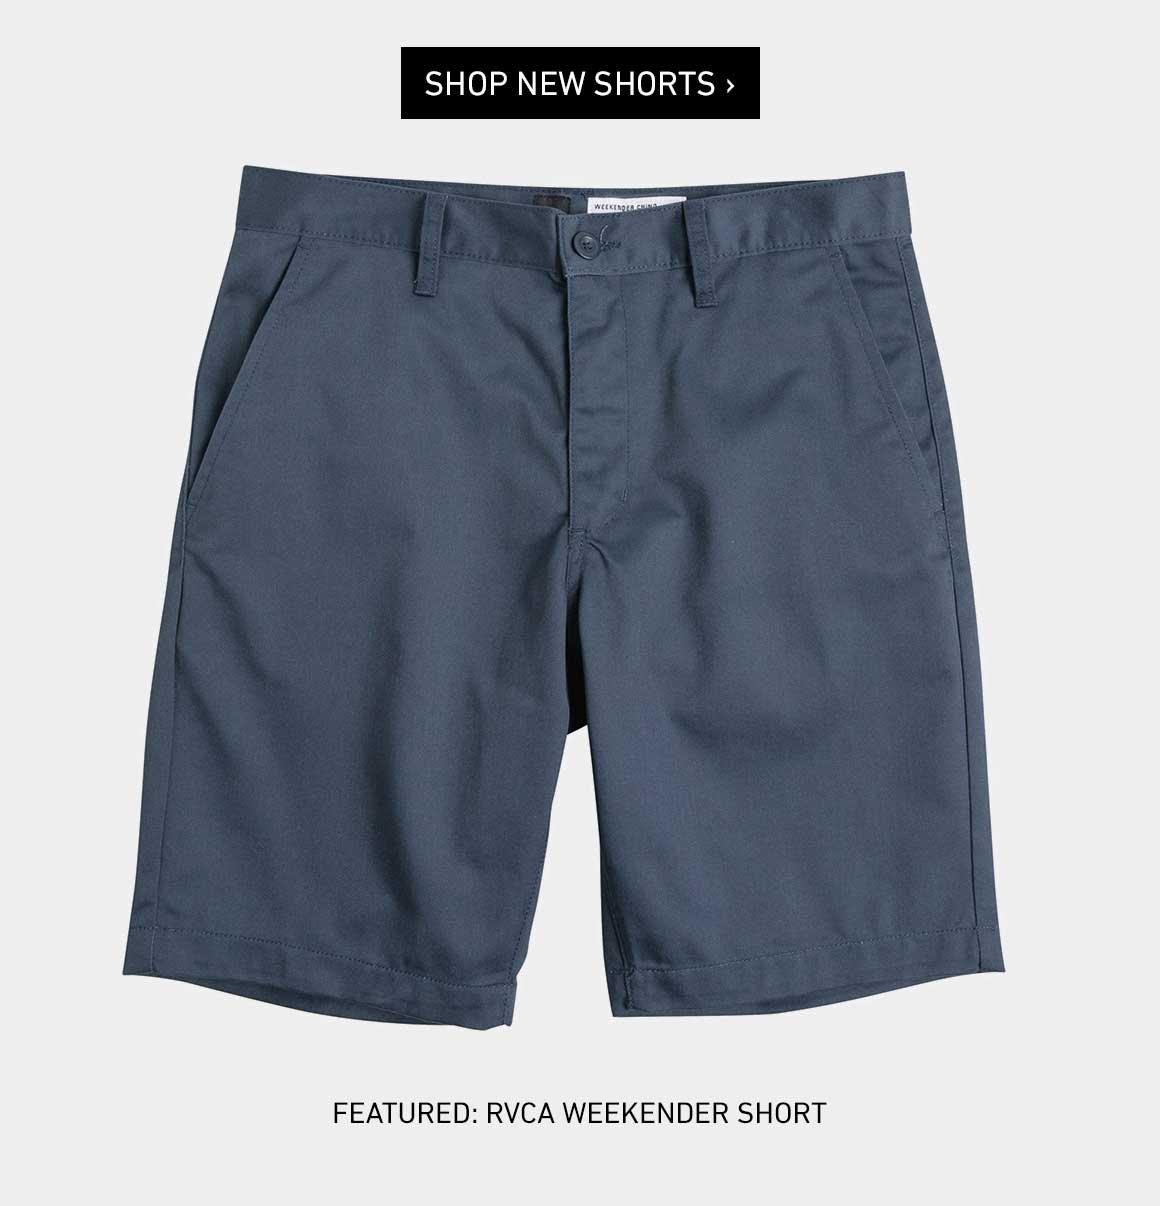 Shop New Shorts